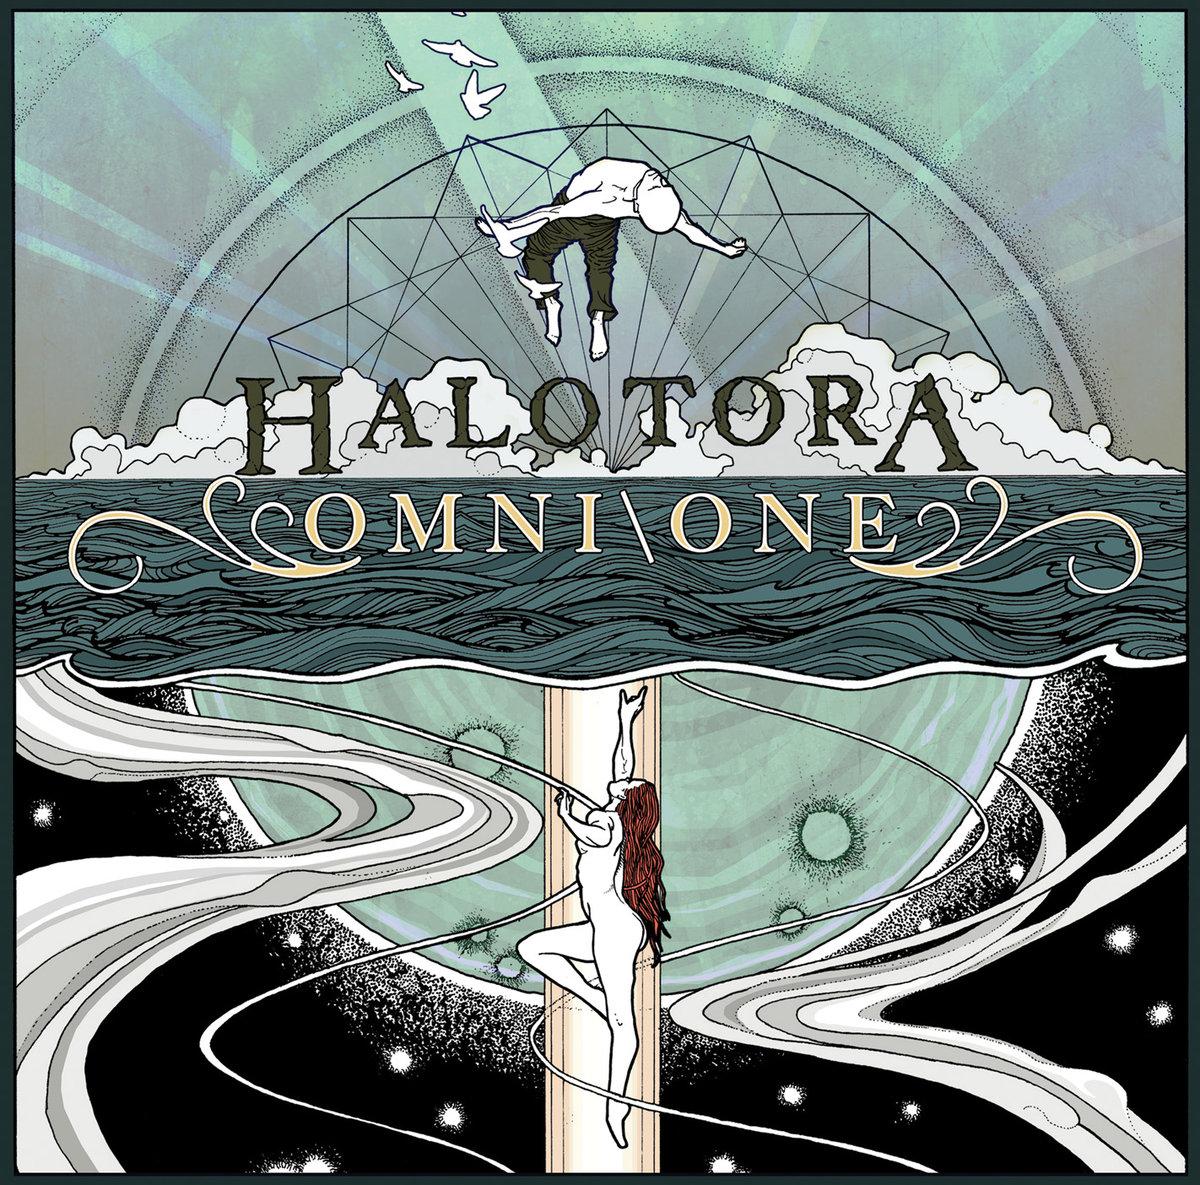 Review Halo Tora Omnione By Kevin Thompson Progradar